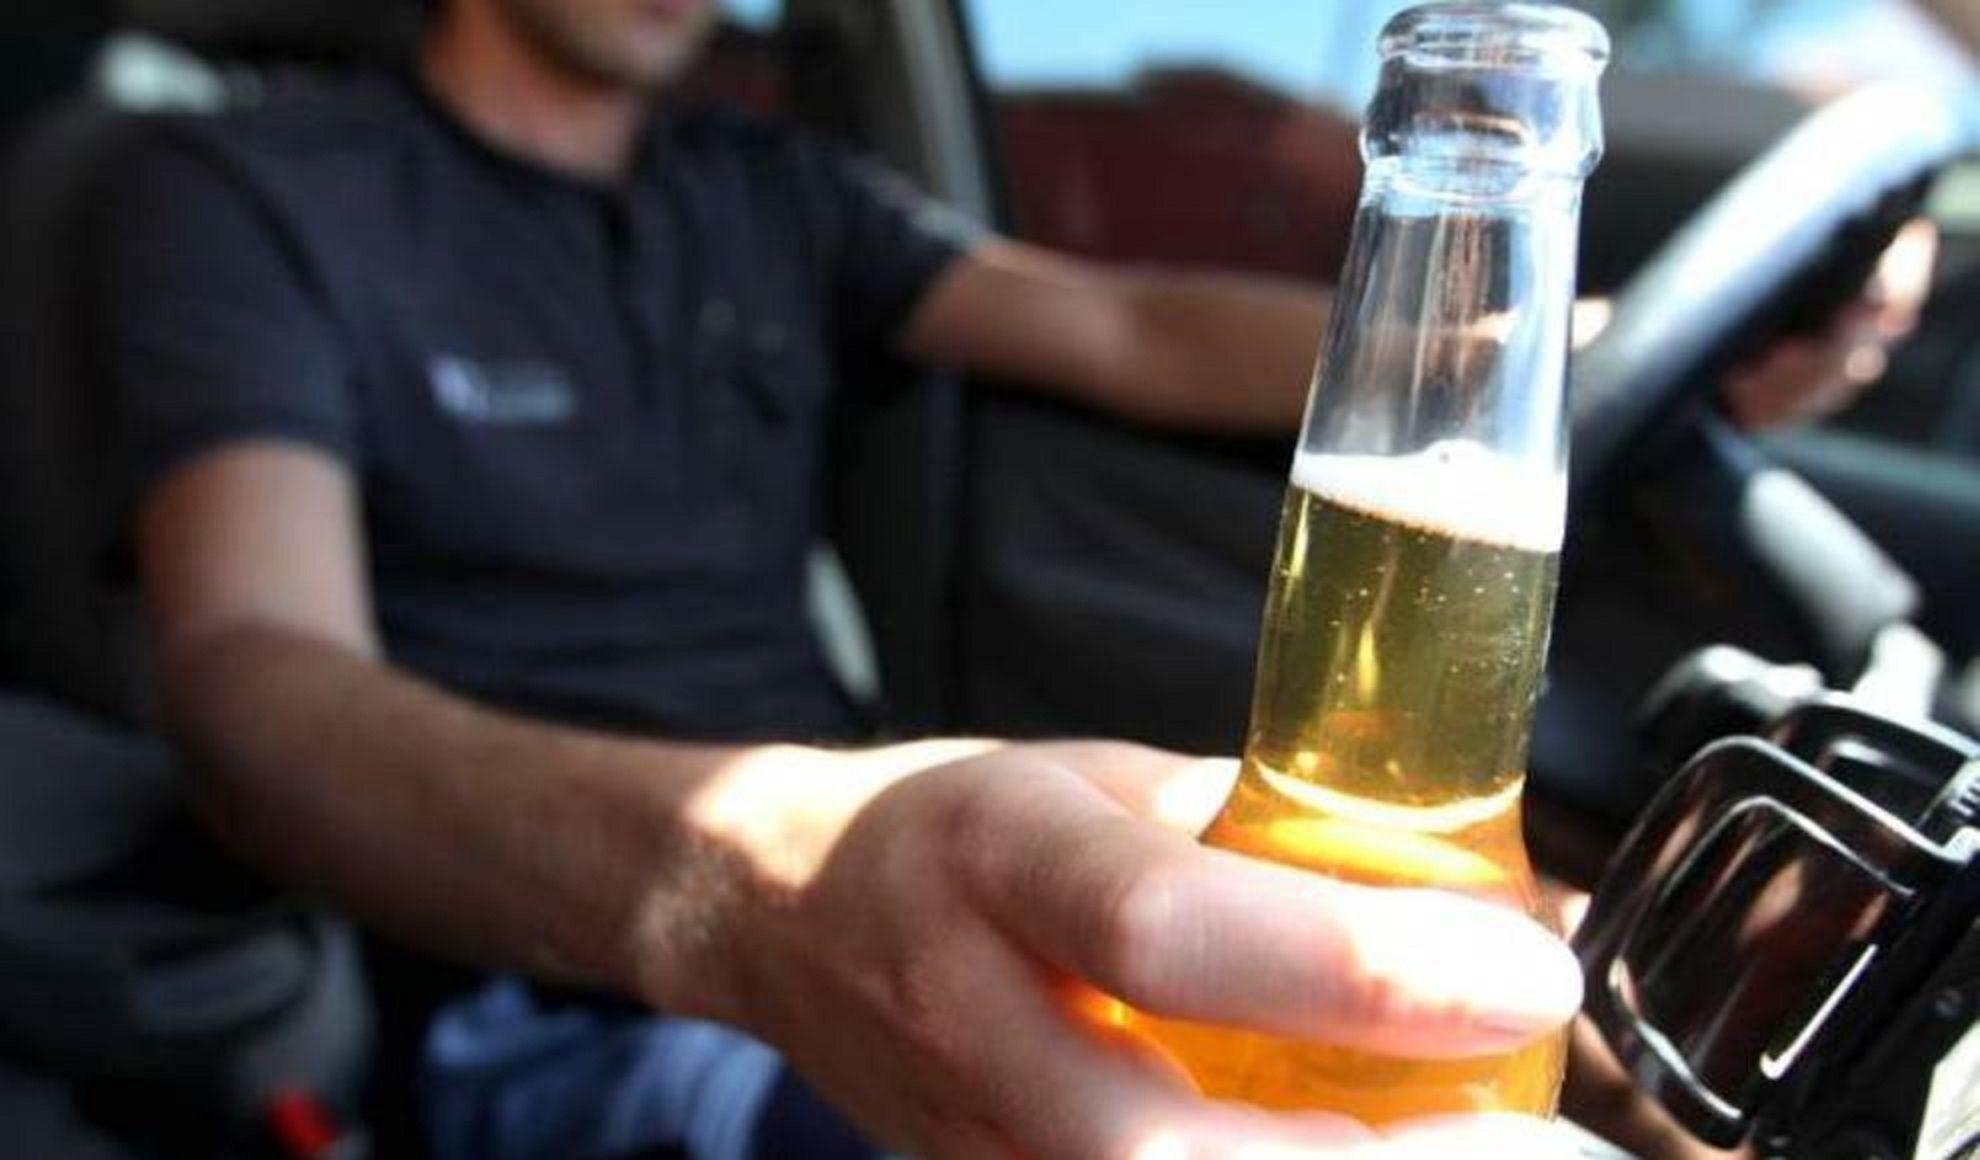 Un hombre fue condenado a ocho días de cárcel por conducir borracho